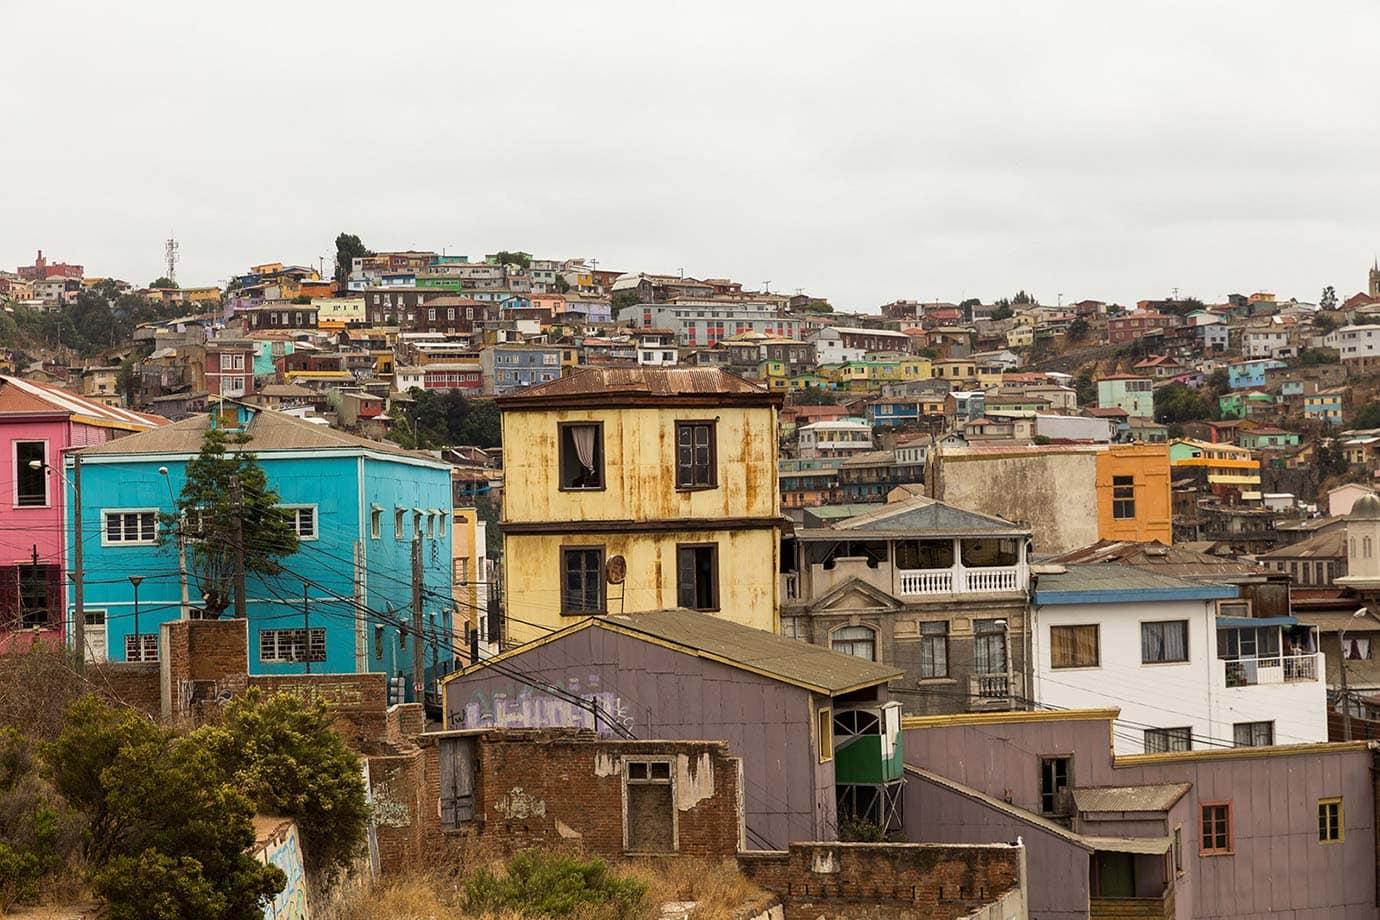 The hills of Valparaiso